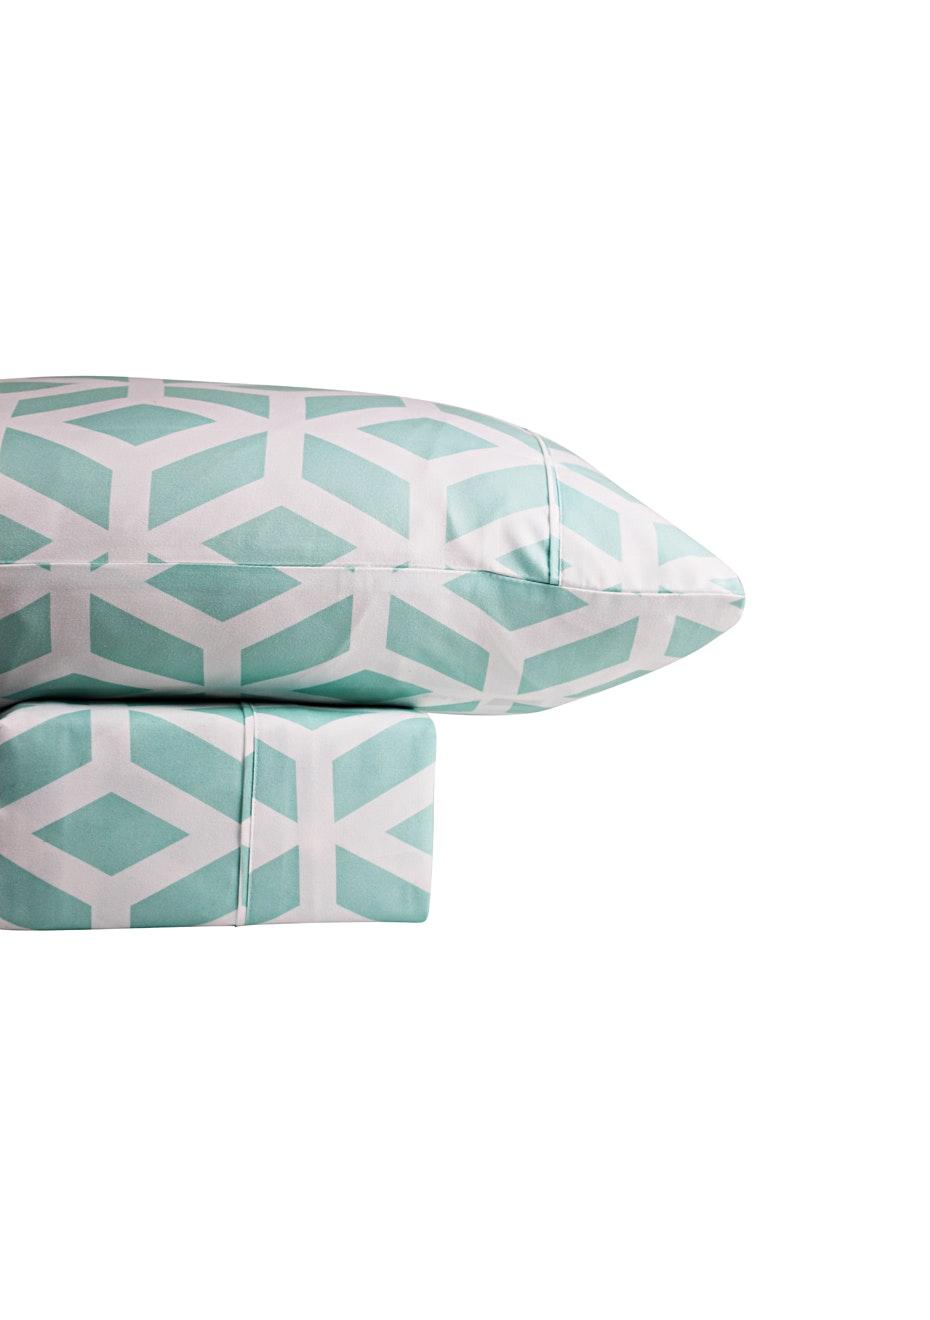 Thermal Flannel Sheet Sets - Manhattan Design - Ice - King Bed